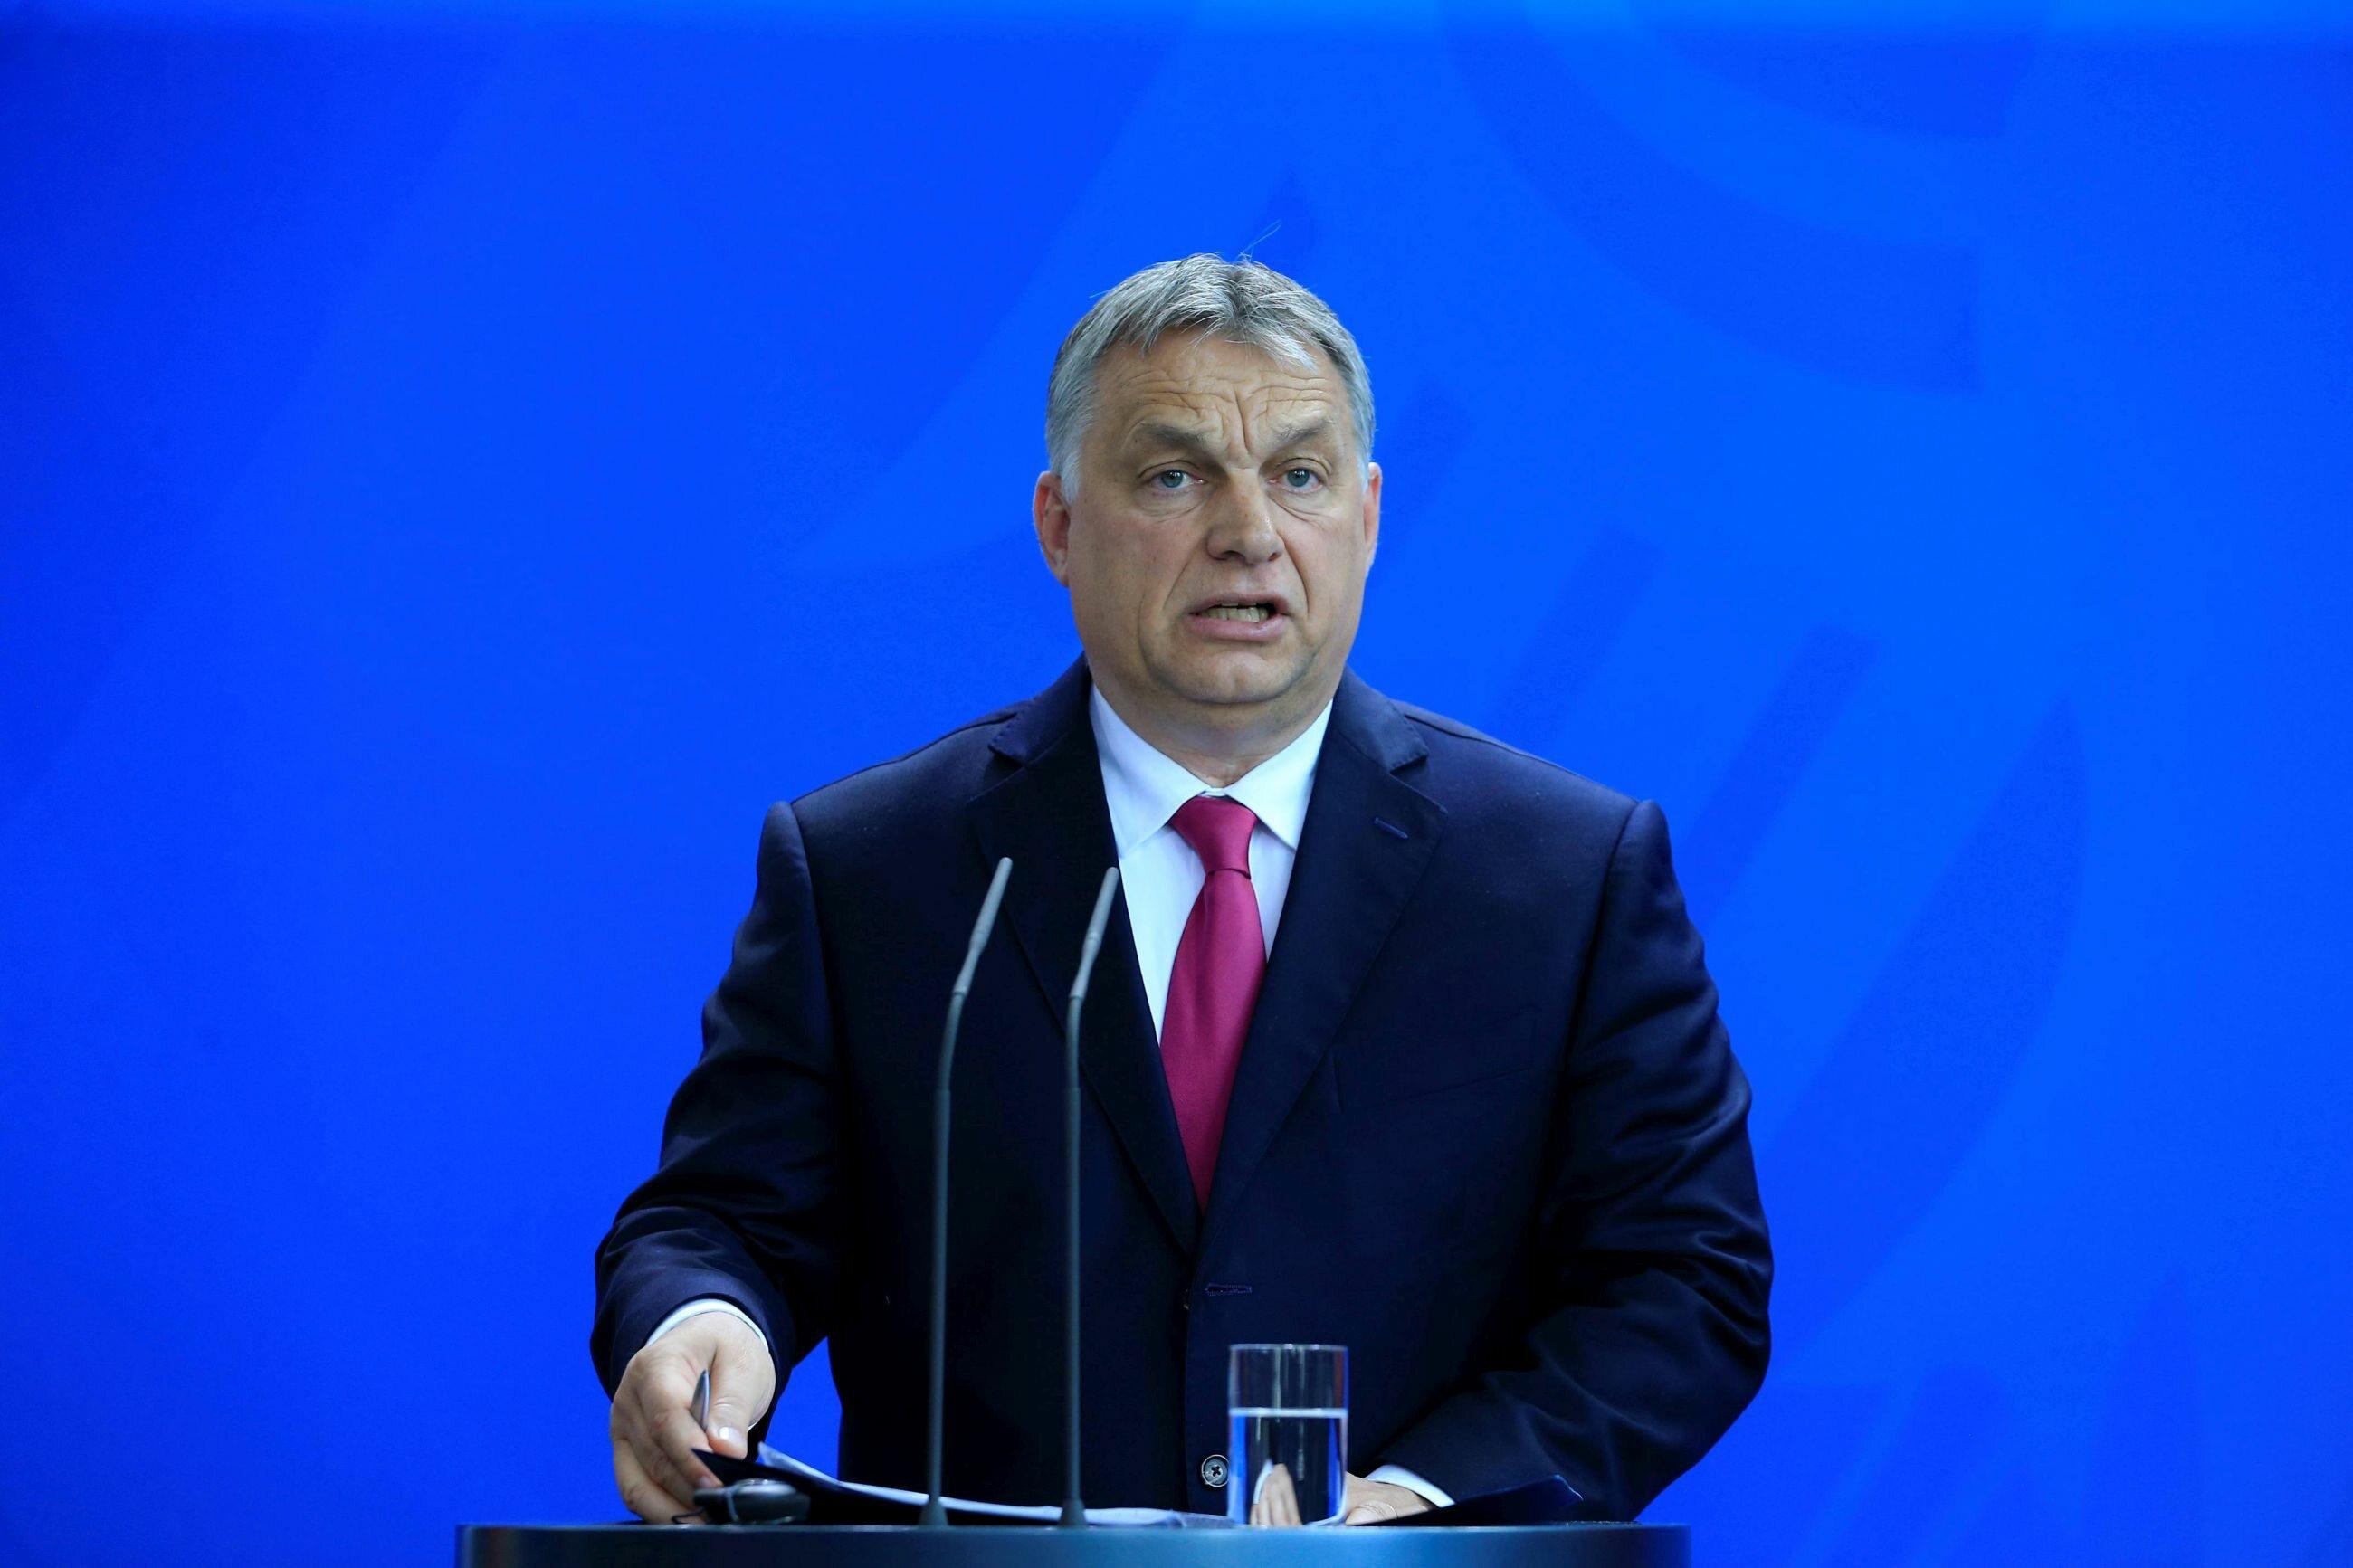 Premier Węgier, Viktor Orban